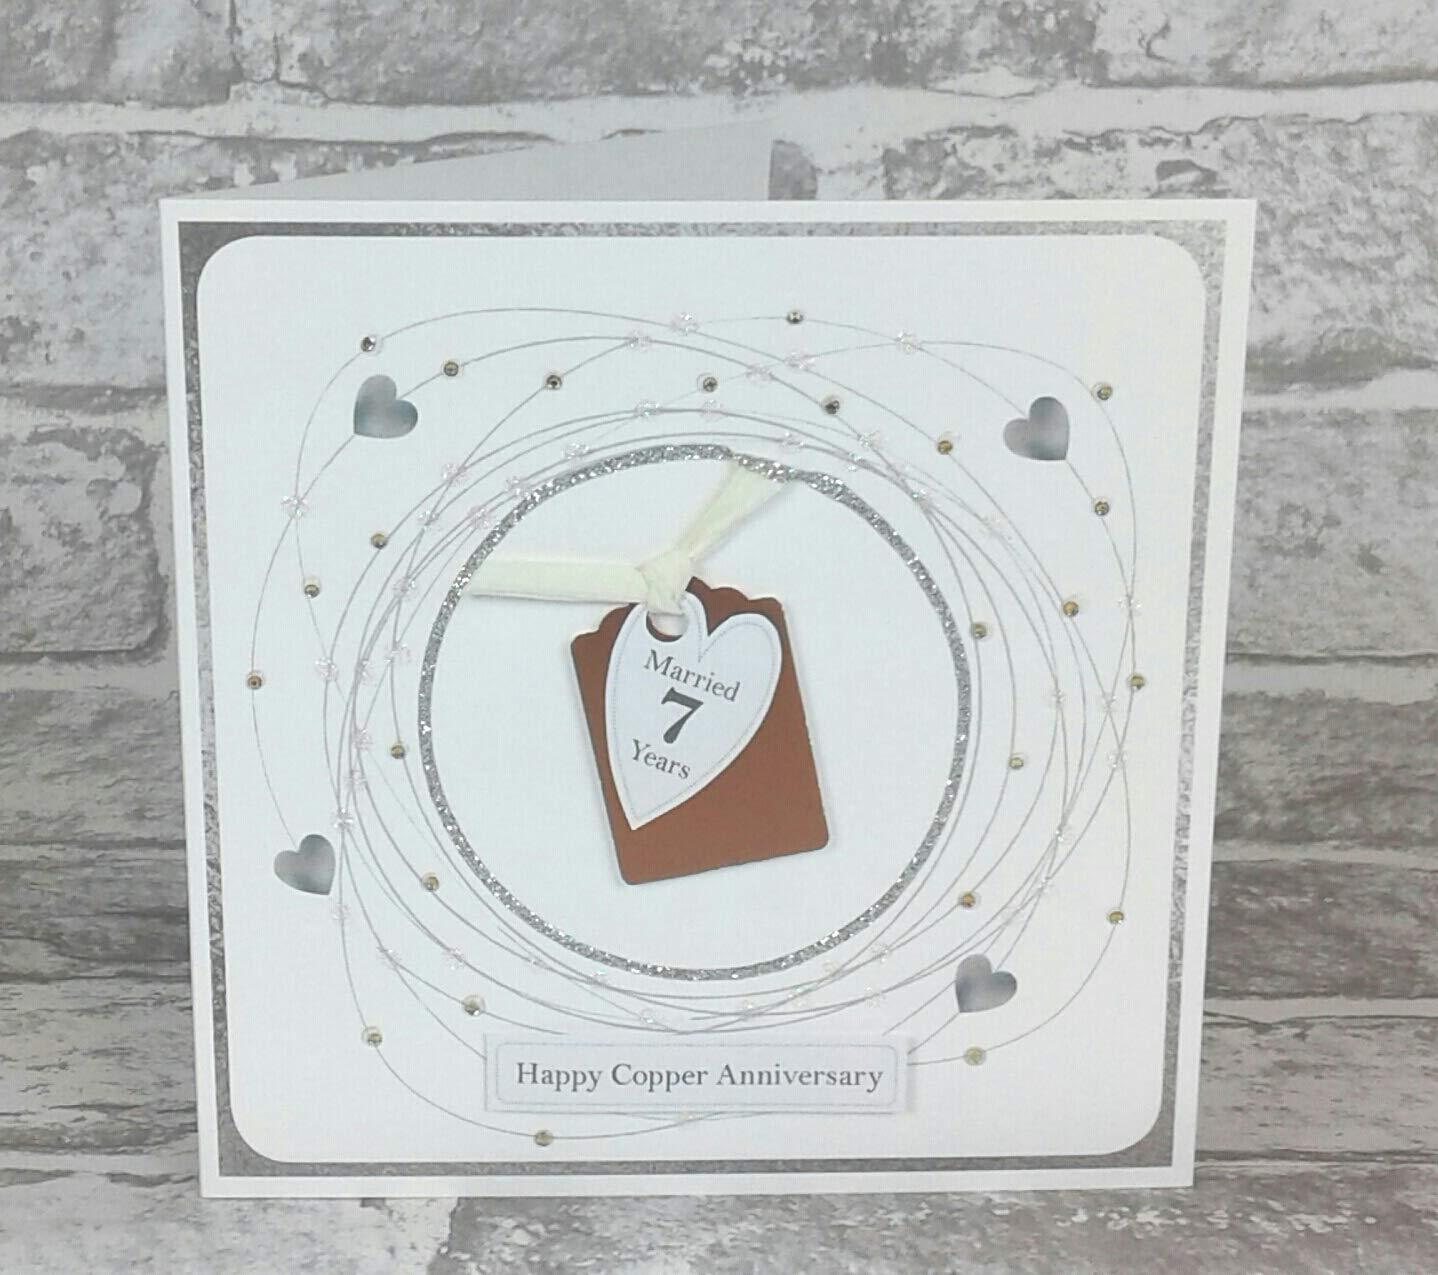 Seventh Personalised Handmade 7th Wedding Anniversary Card Copper Iron